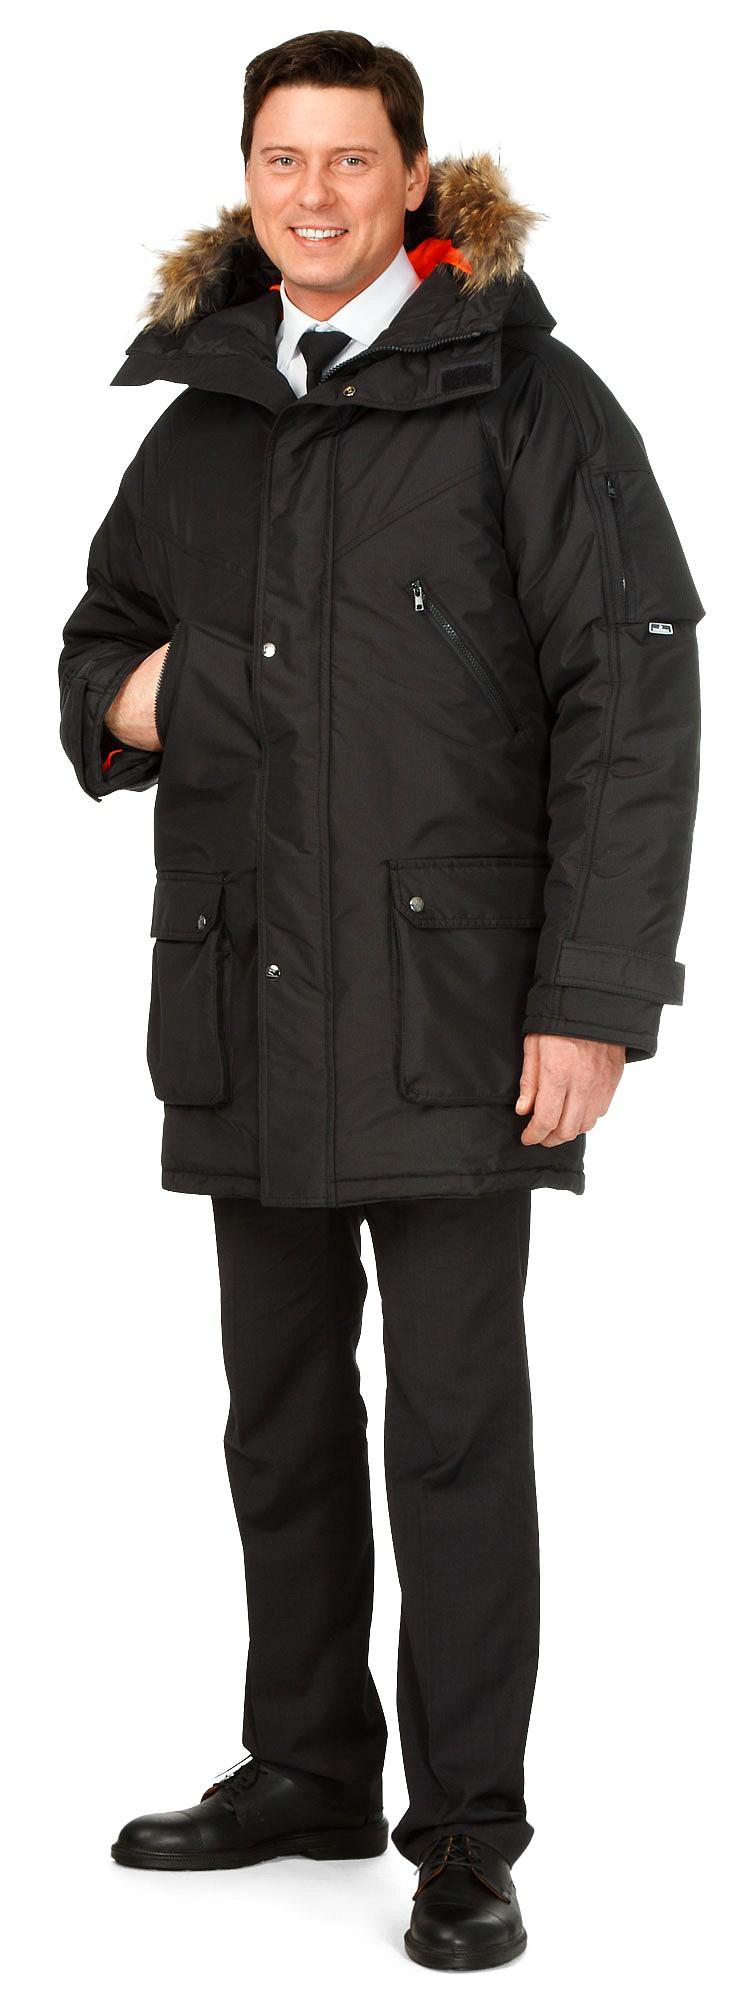 8b1d7d3d9e7e Куртка «Аляска» мужская зимняя :: Техноавиа